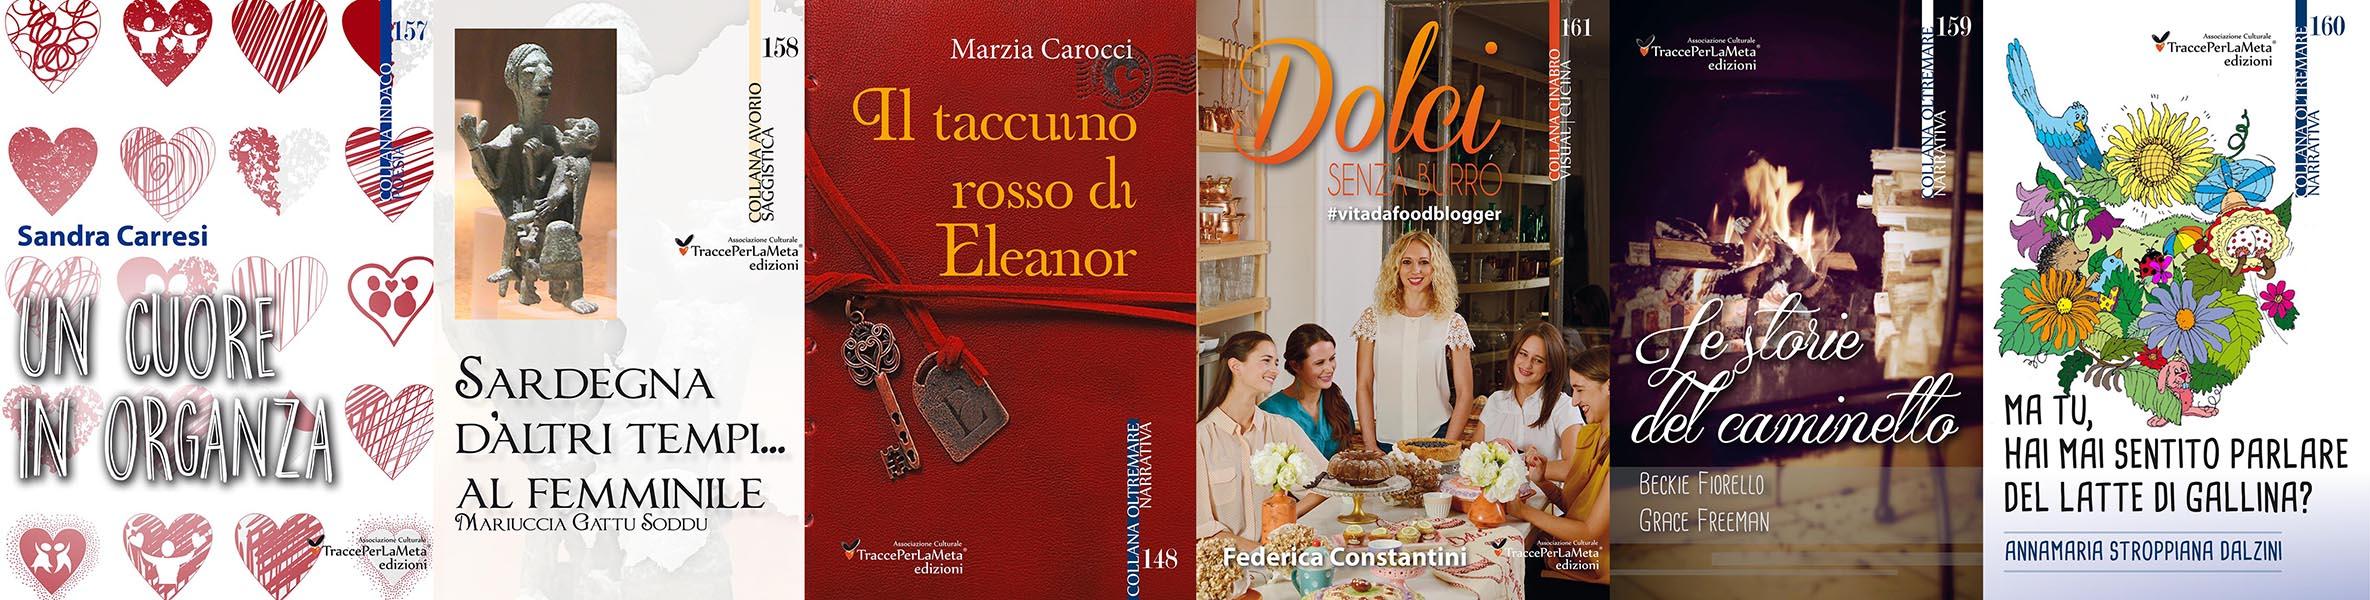 Libri in uscita a novembre 2015 di TraccePerLaMeta Edizioni